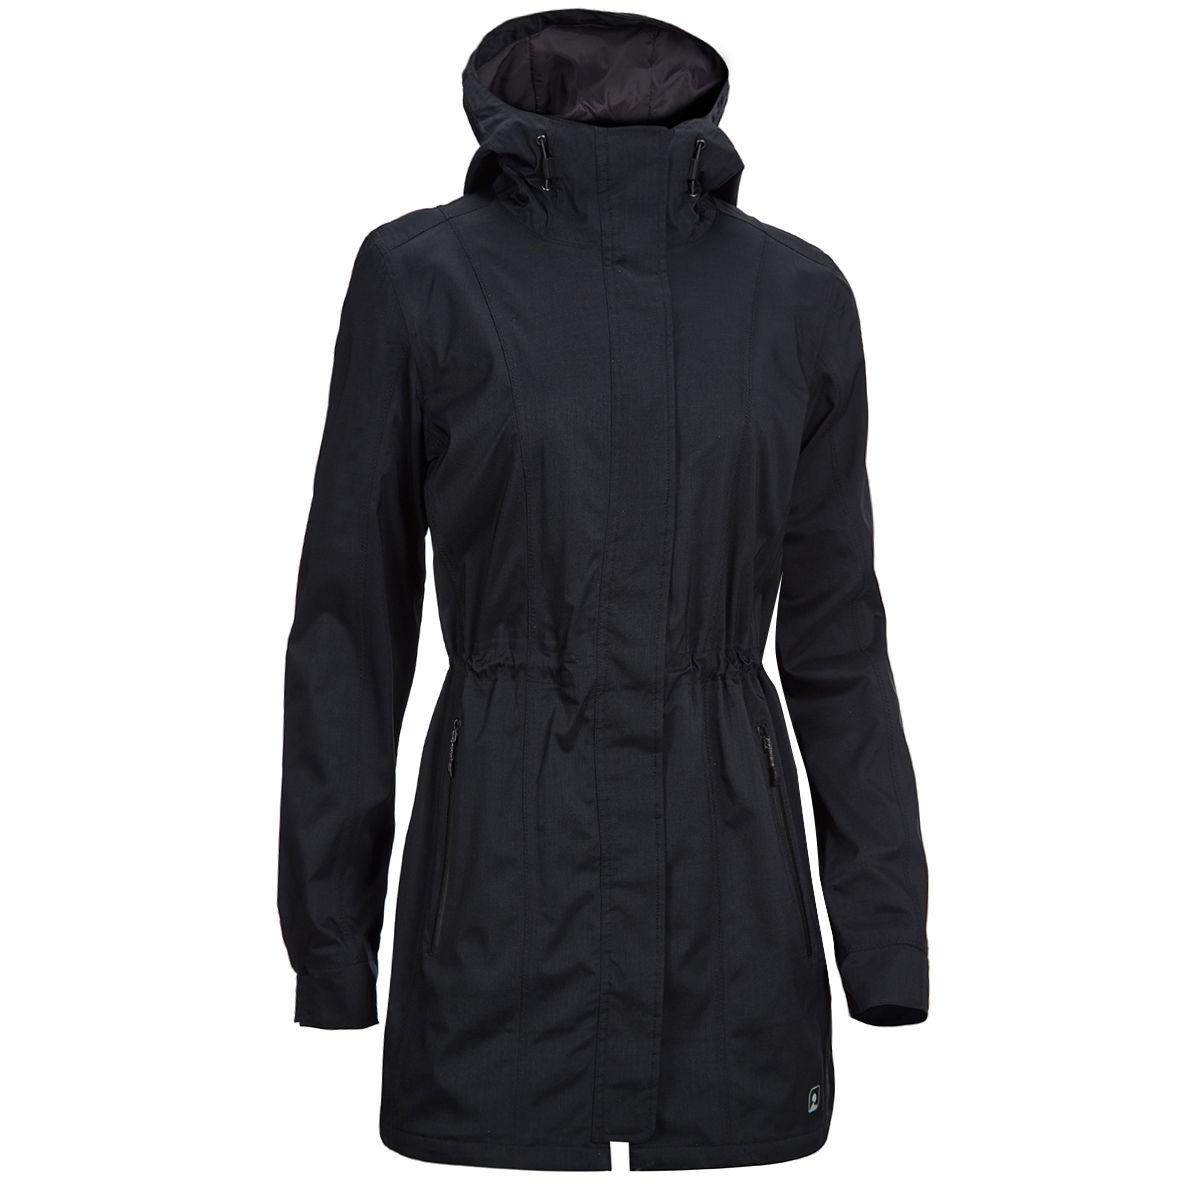 EMS Mist Jacket